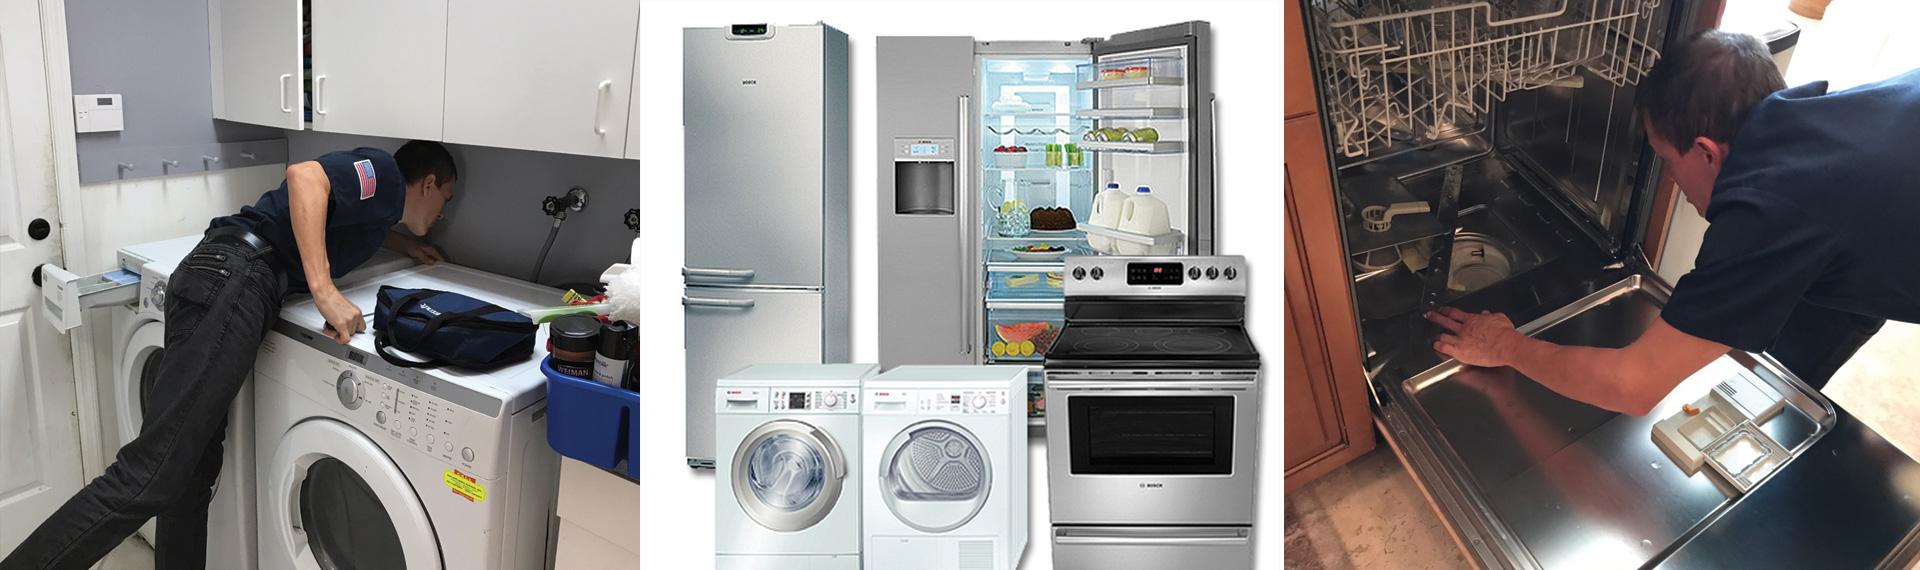 1A Appliance Service Hollywood FL